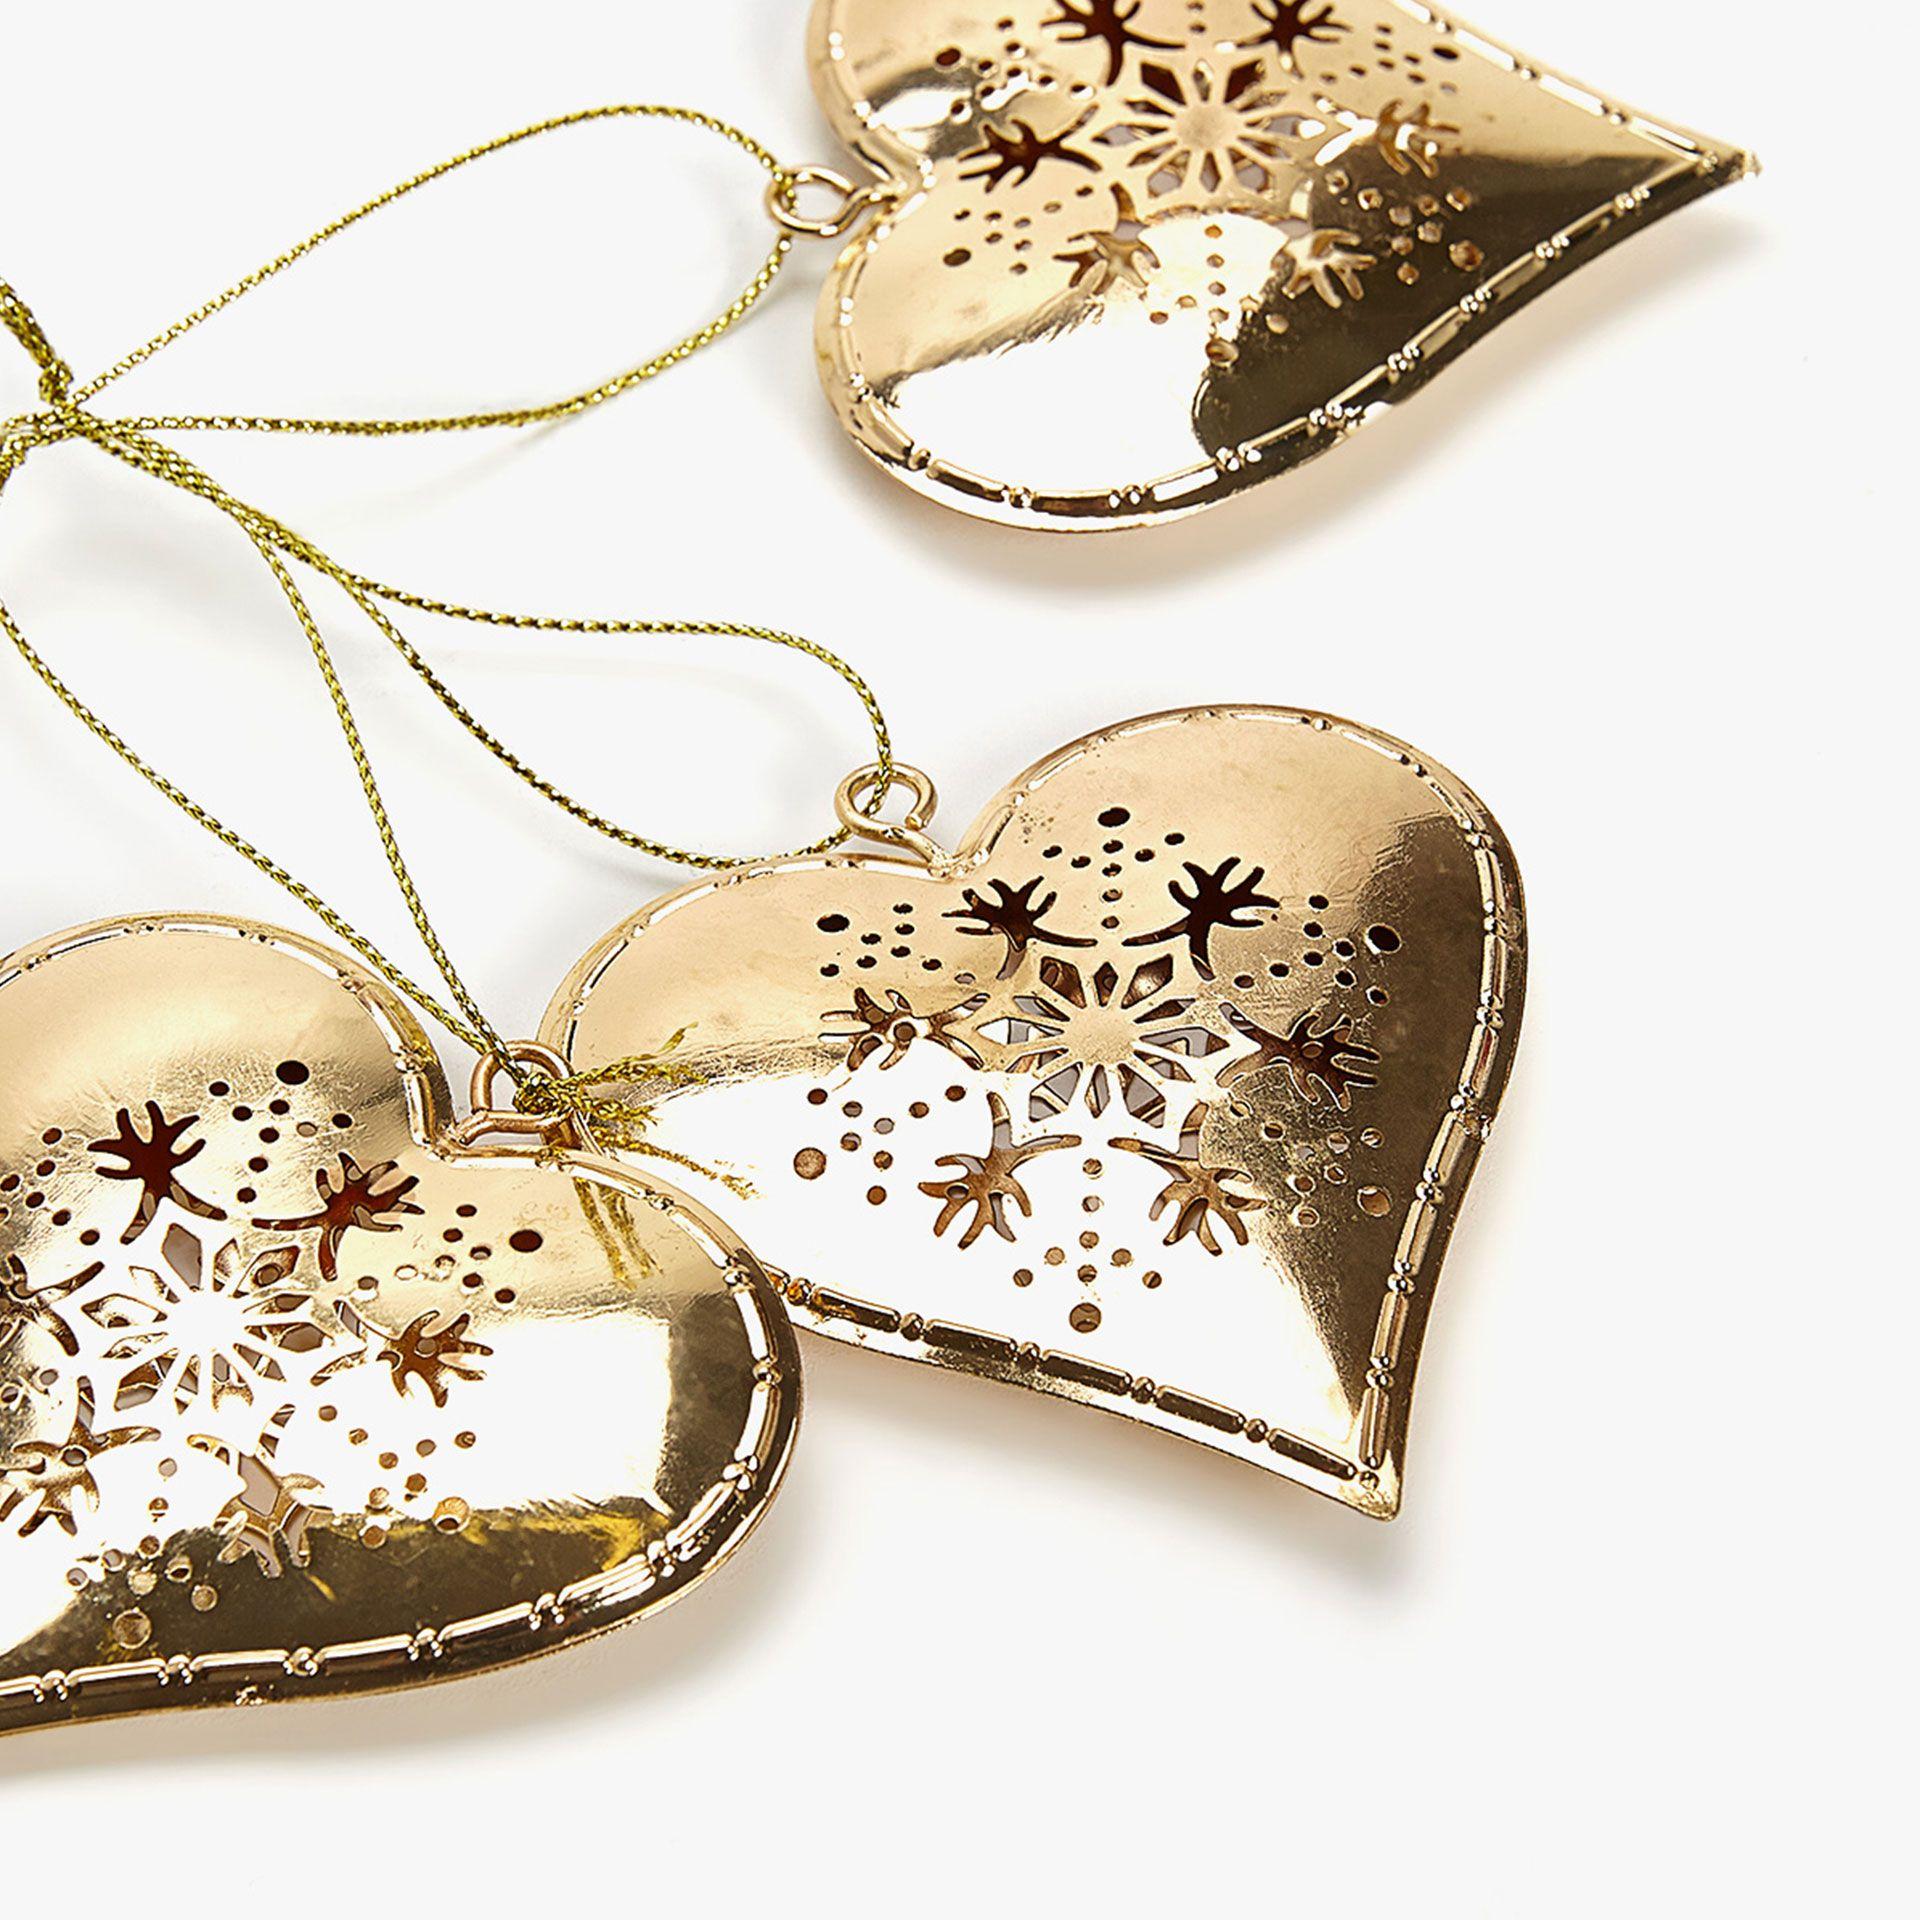 Hanging Gold Heart Decoration Rsd899 00 Ref 4908 060 Heart Decorations Zara Home Heart Ornament